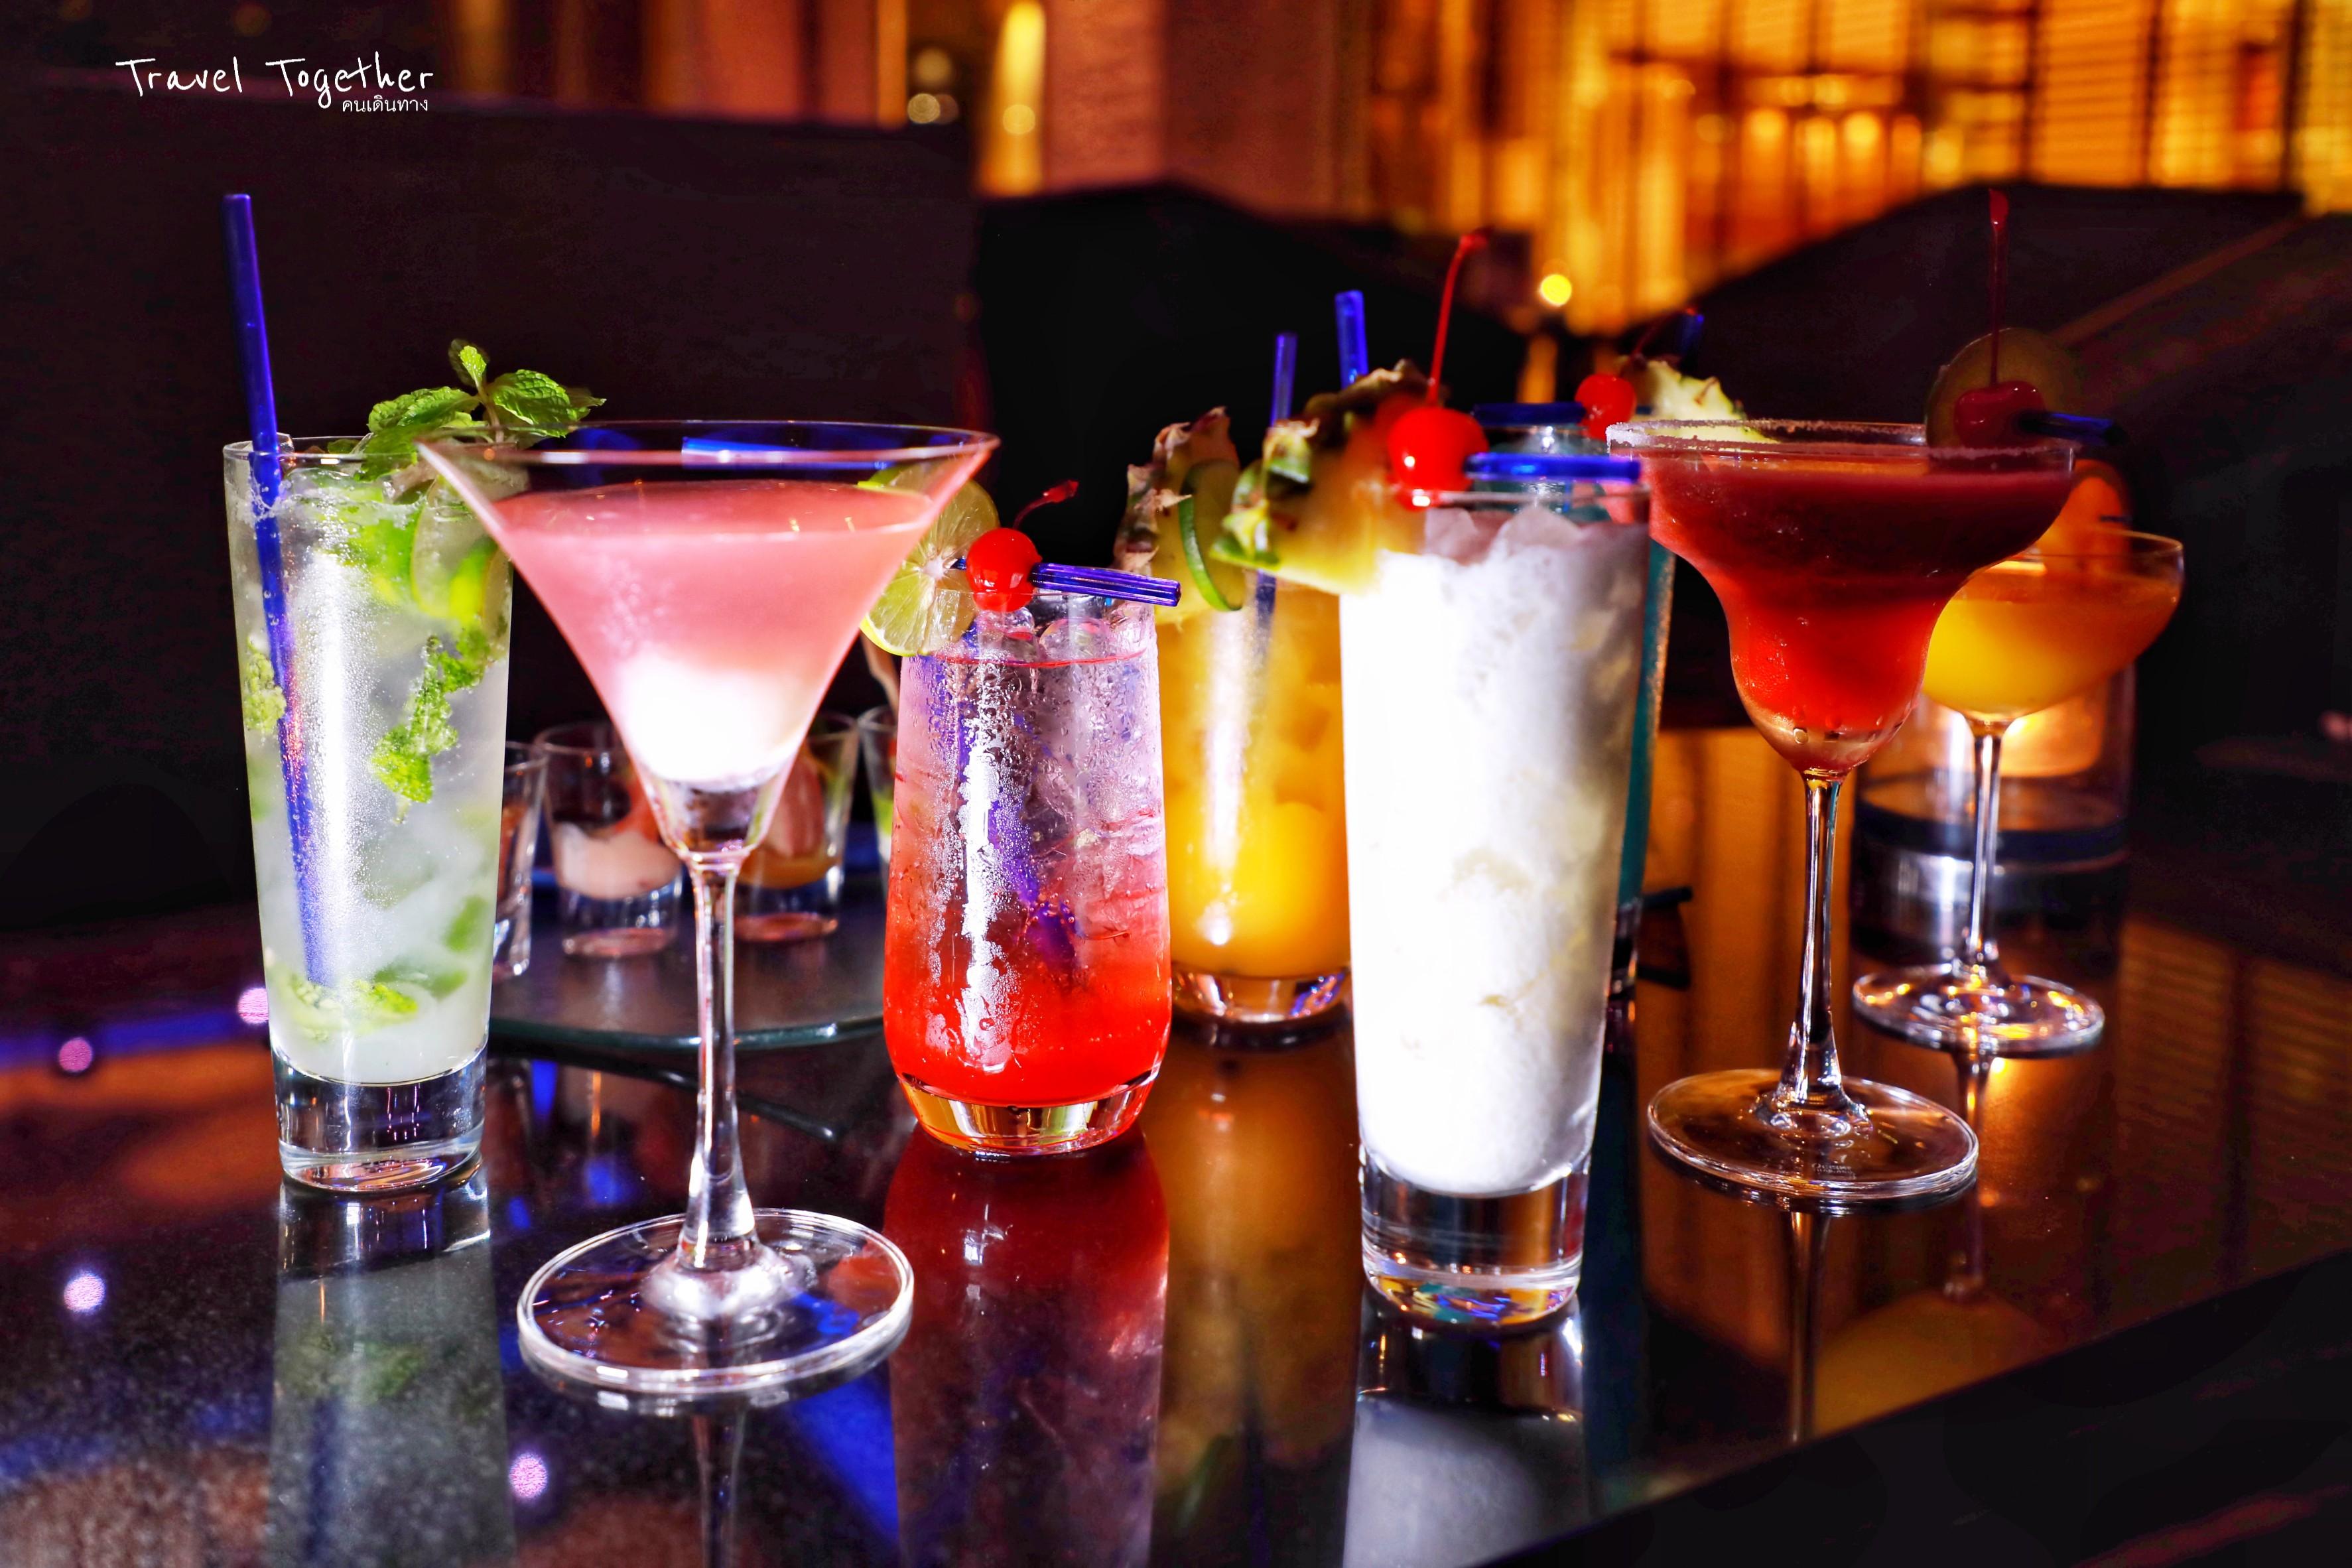 Cocktail Party Night ดื่มกันได้ไม่อั้น ที่ The Landmark Bangkok